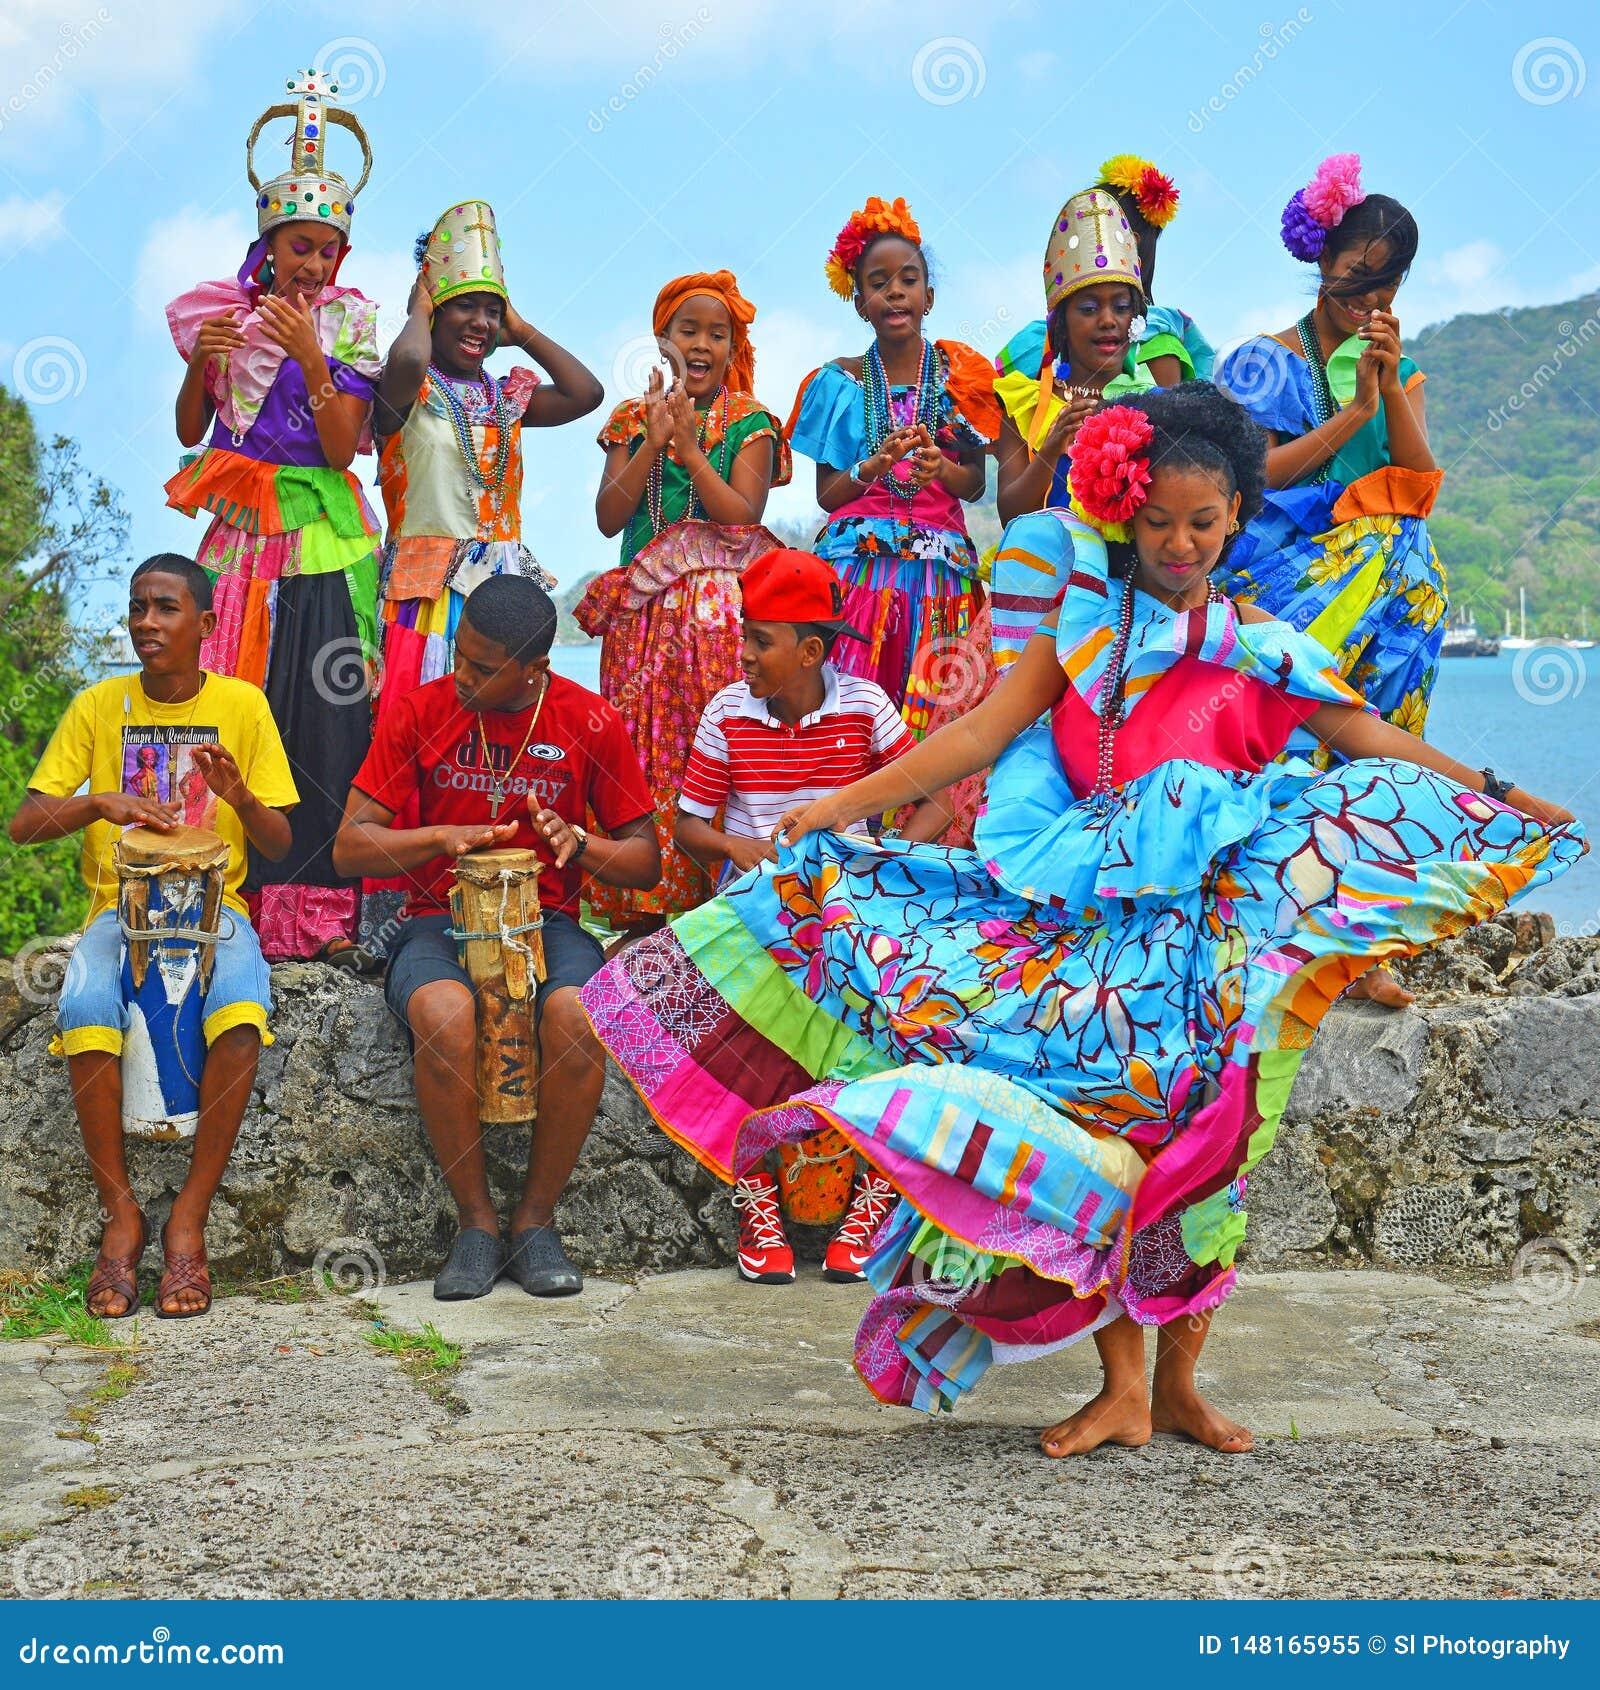 Congo Dance In Portobelo, Panama Editorial Image